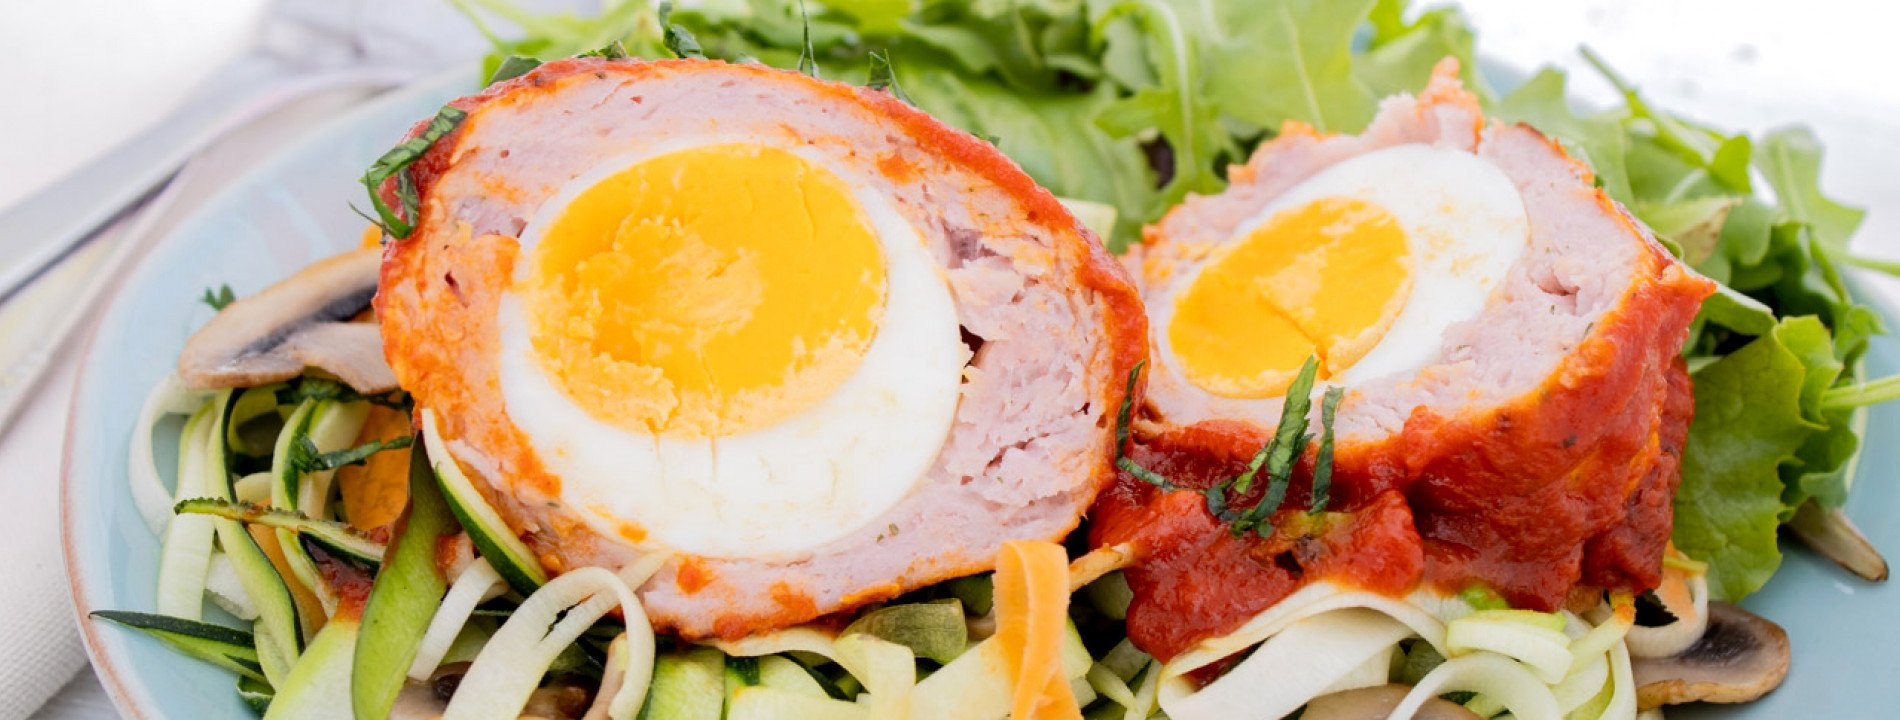 Chicken Meatballs with Egg and Zucchini Linguini